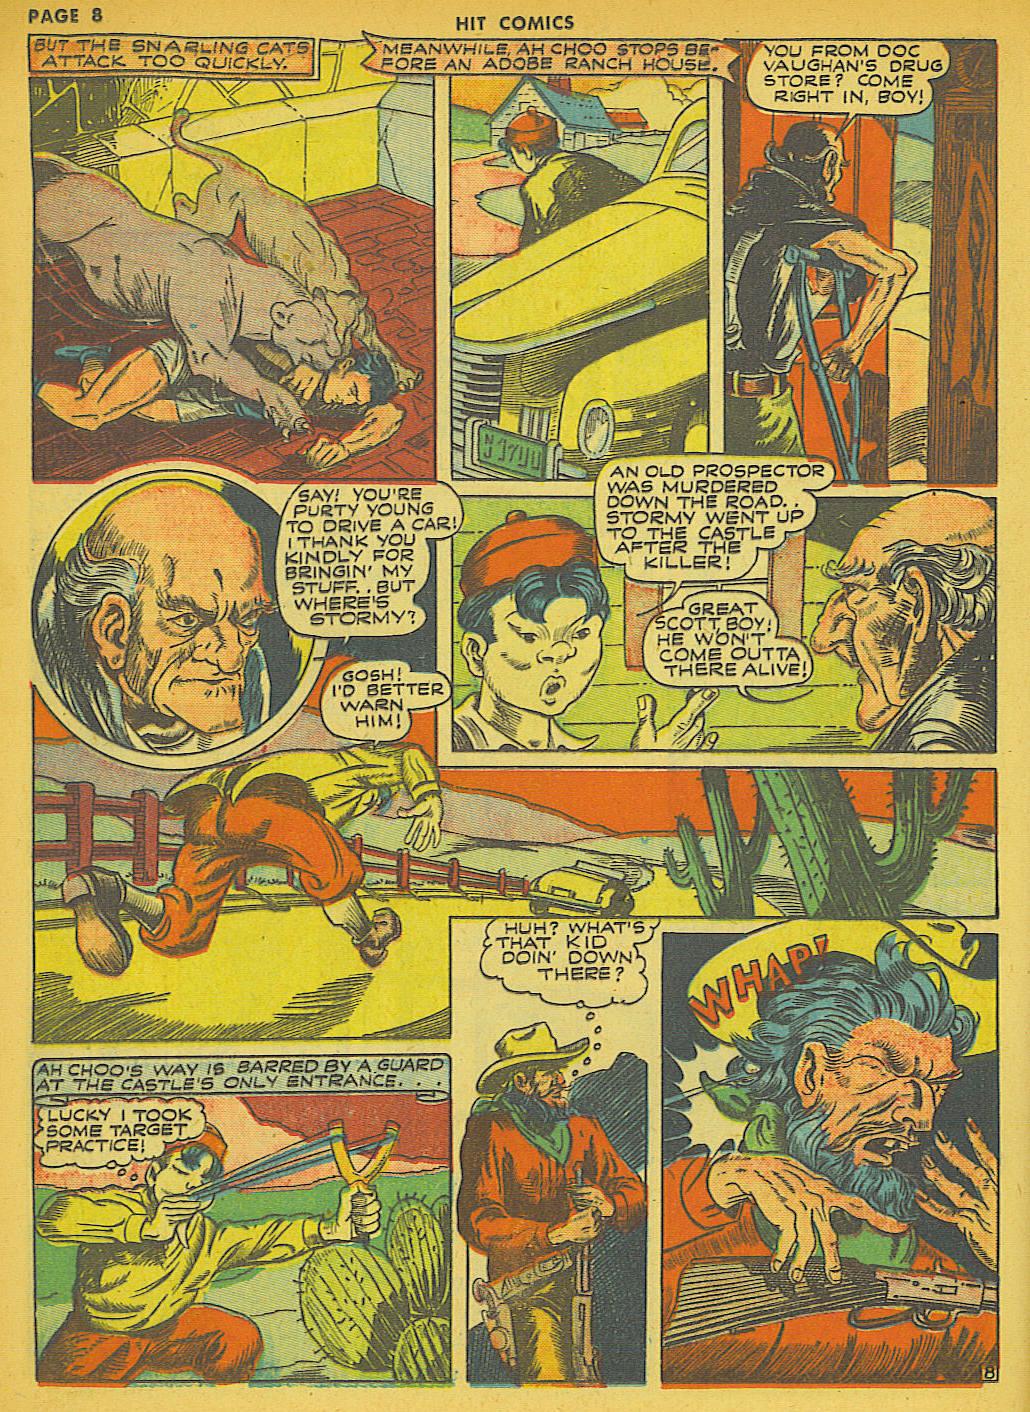 Read online Hit Comics comic -  Issue #21 - 10